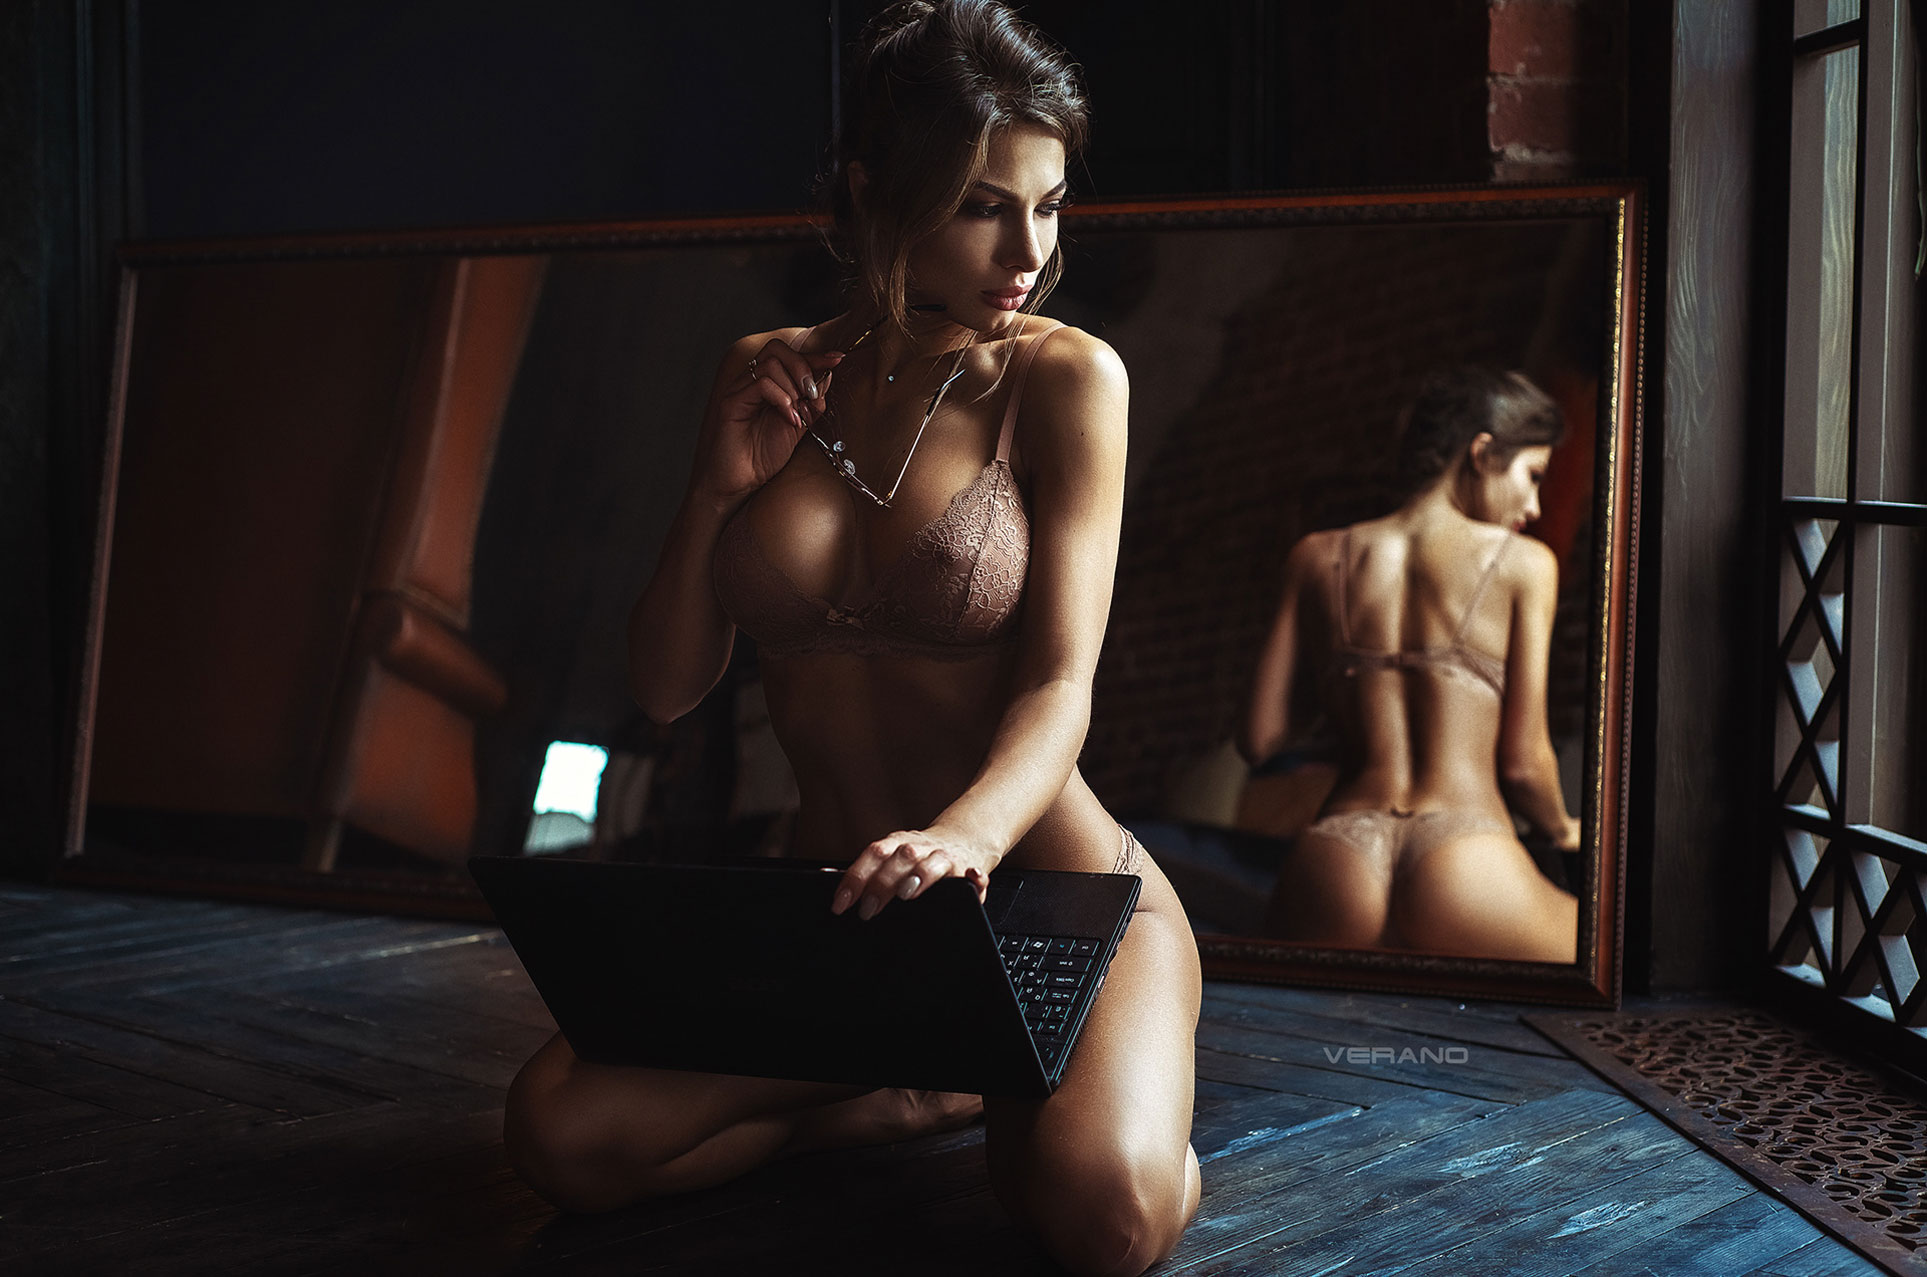 Дарья Шай / Daria Shy by Nikolas Verano